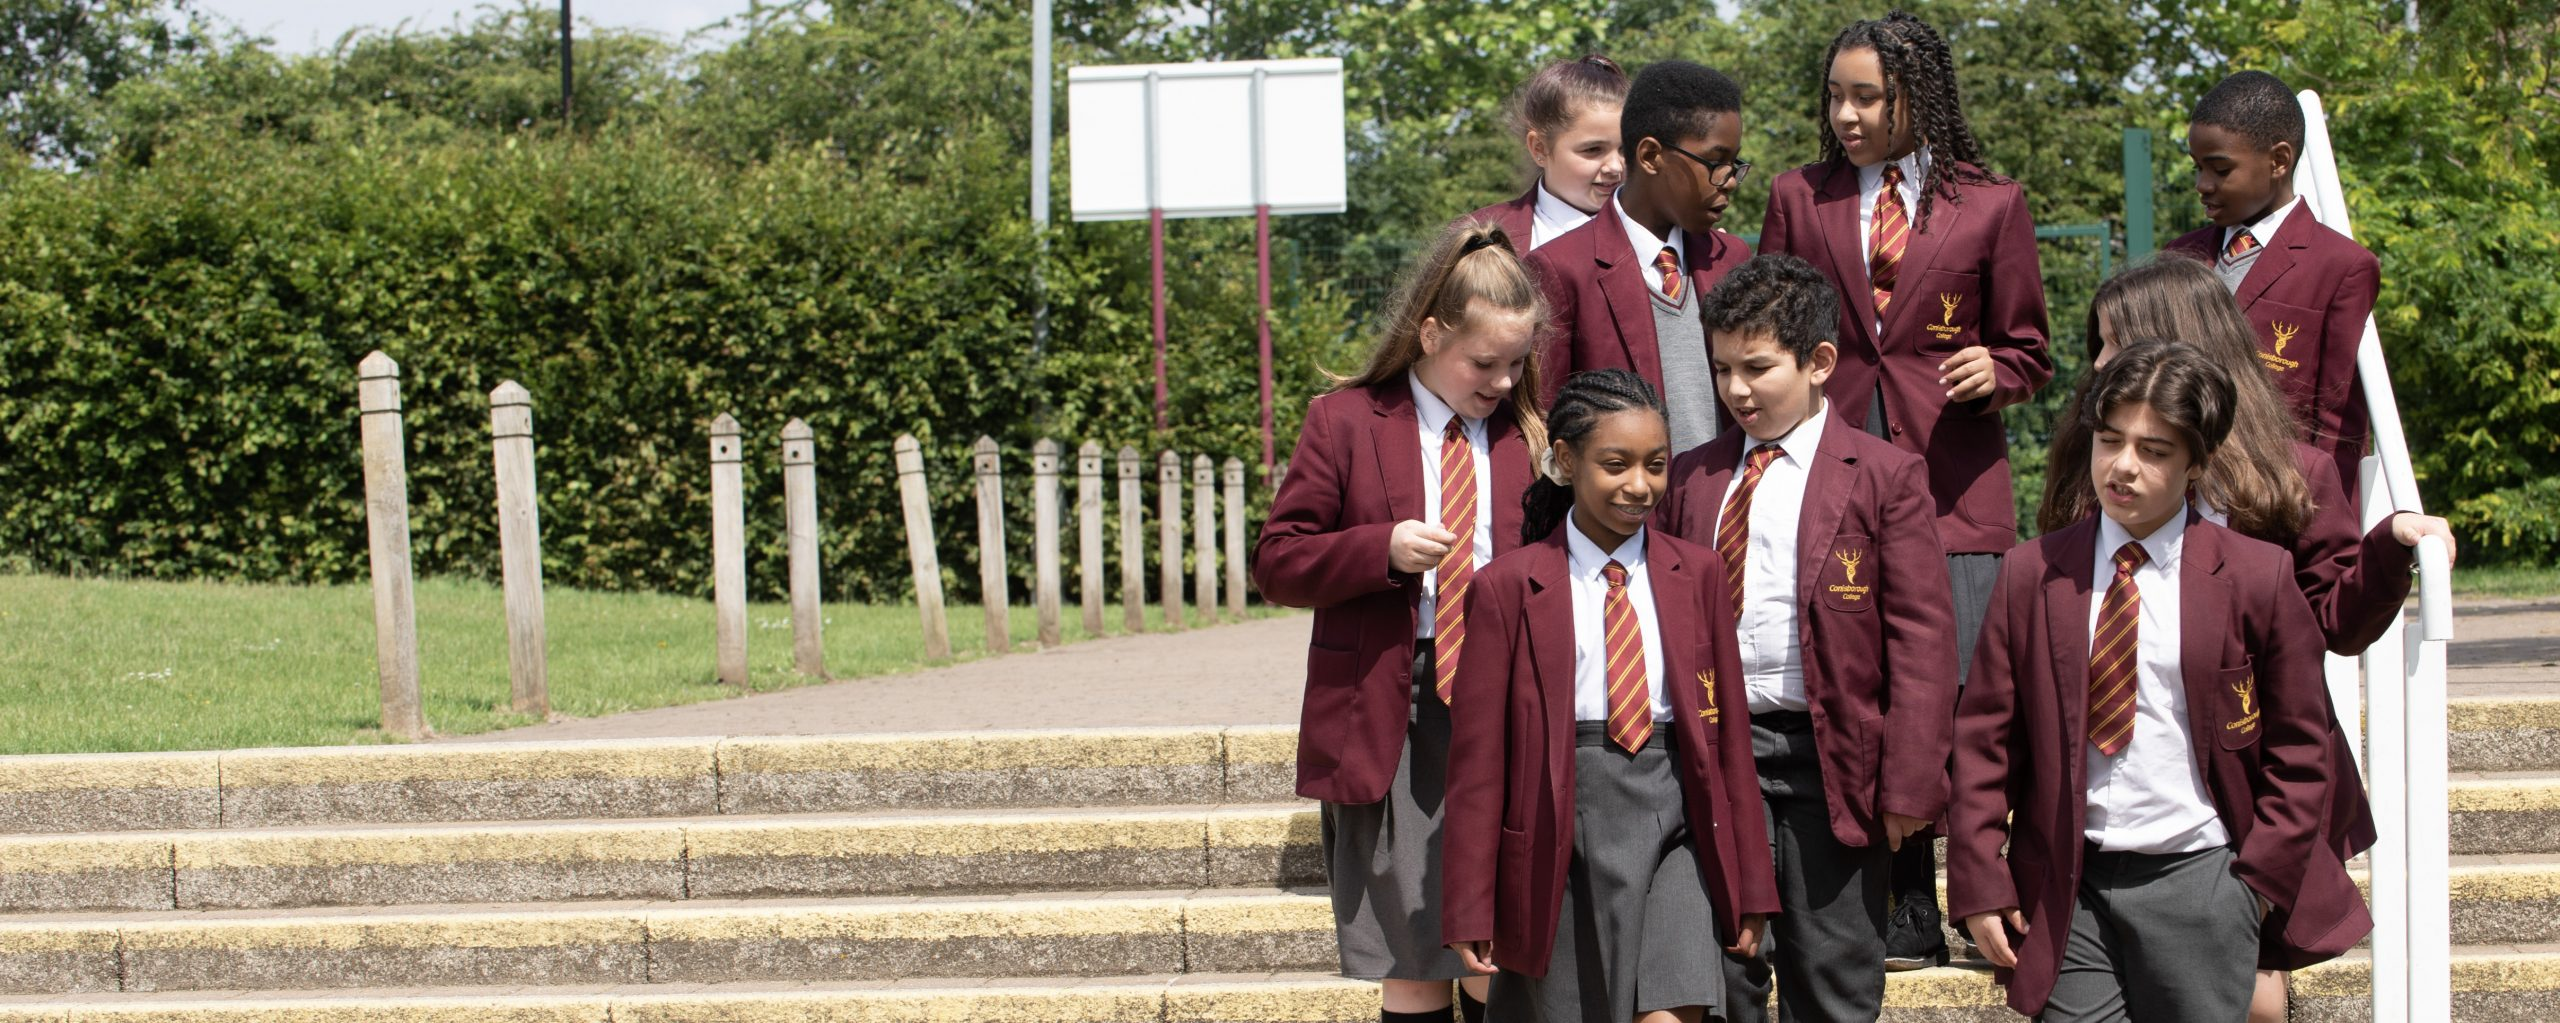 Conisborough College Students Outdoors Lewisham